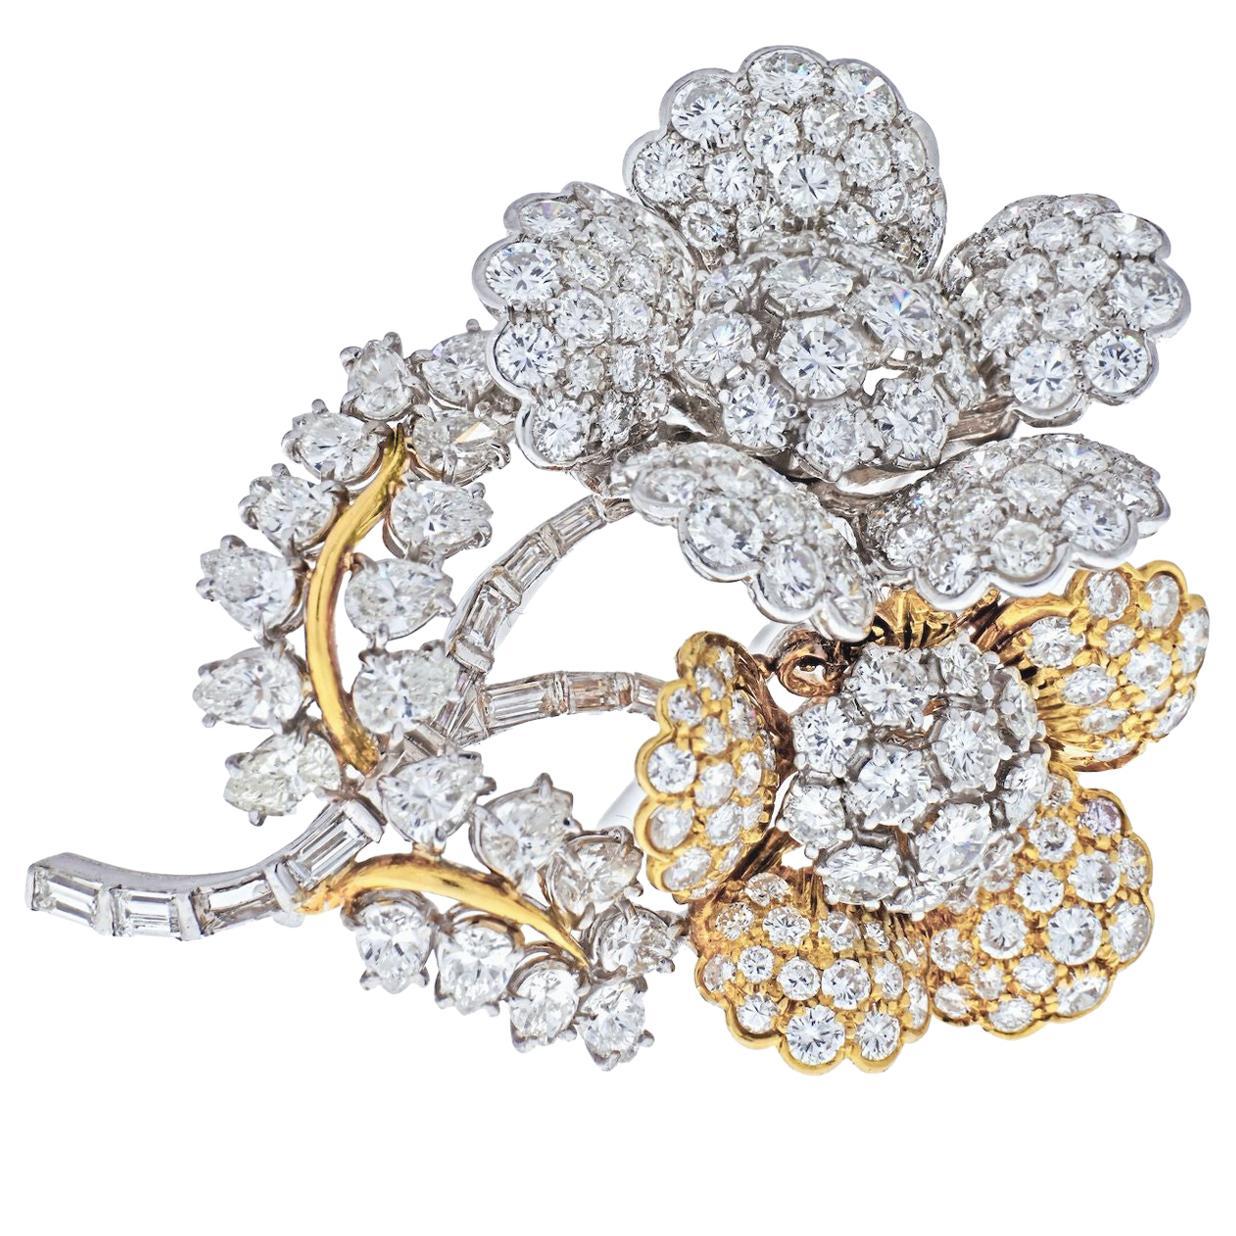 Flower Blossom Diamond, Sapphire, Rubies, Emeralds Brooch